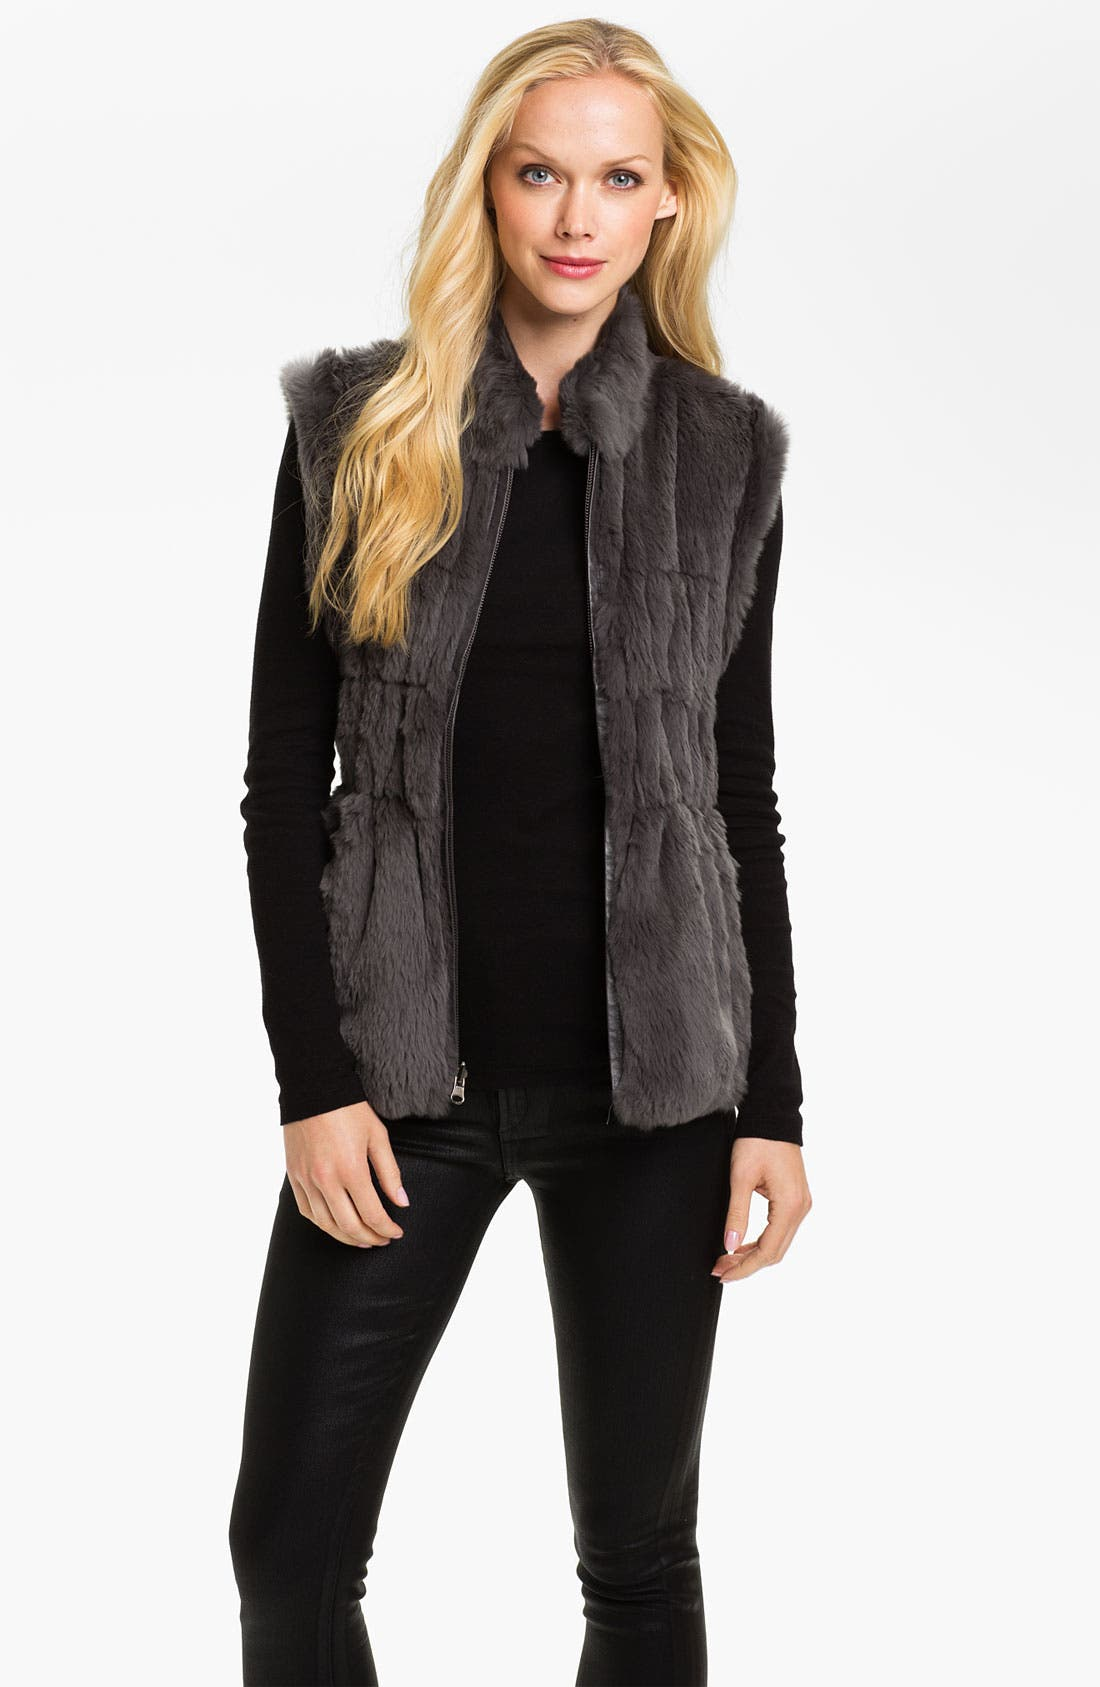 Alternate Image 1 Selected - Linda Richards Reversible Genuine Rabbit Fur Front Vest